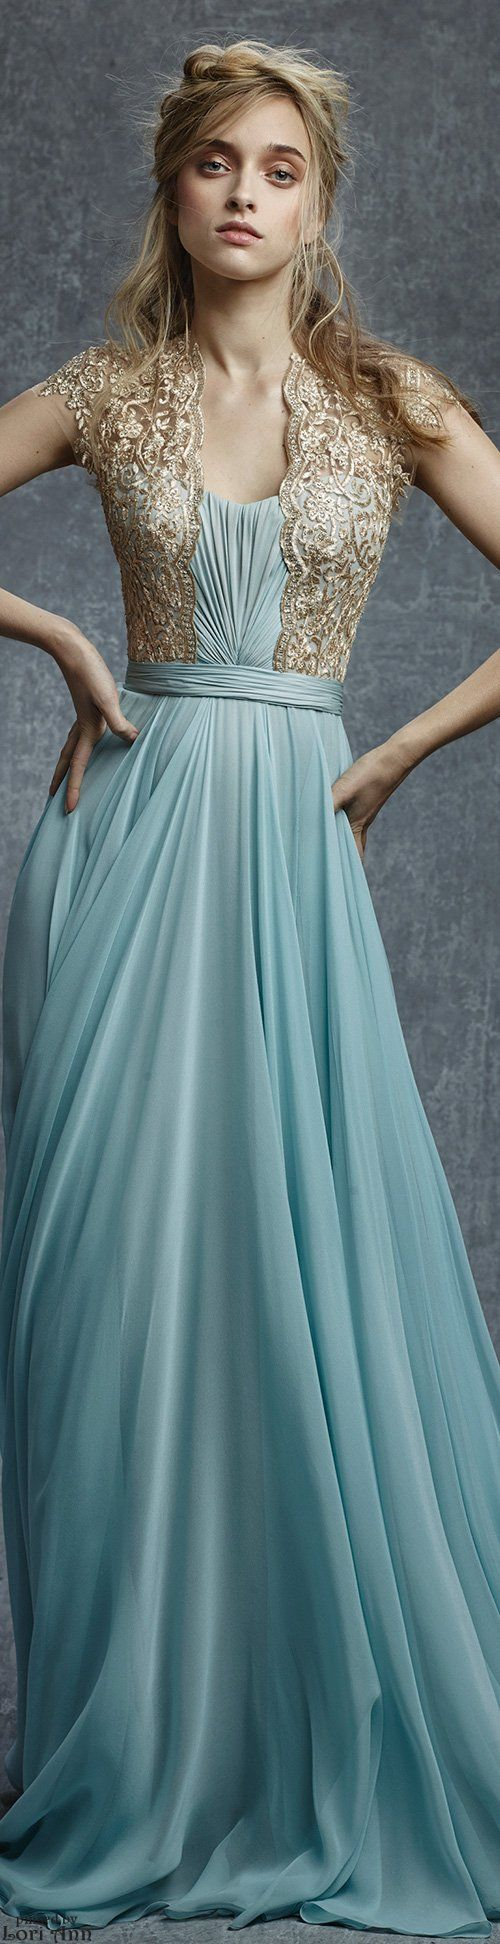 Reem acra evening gown aqua prefall this has duchess of